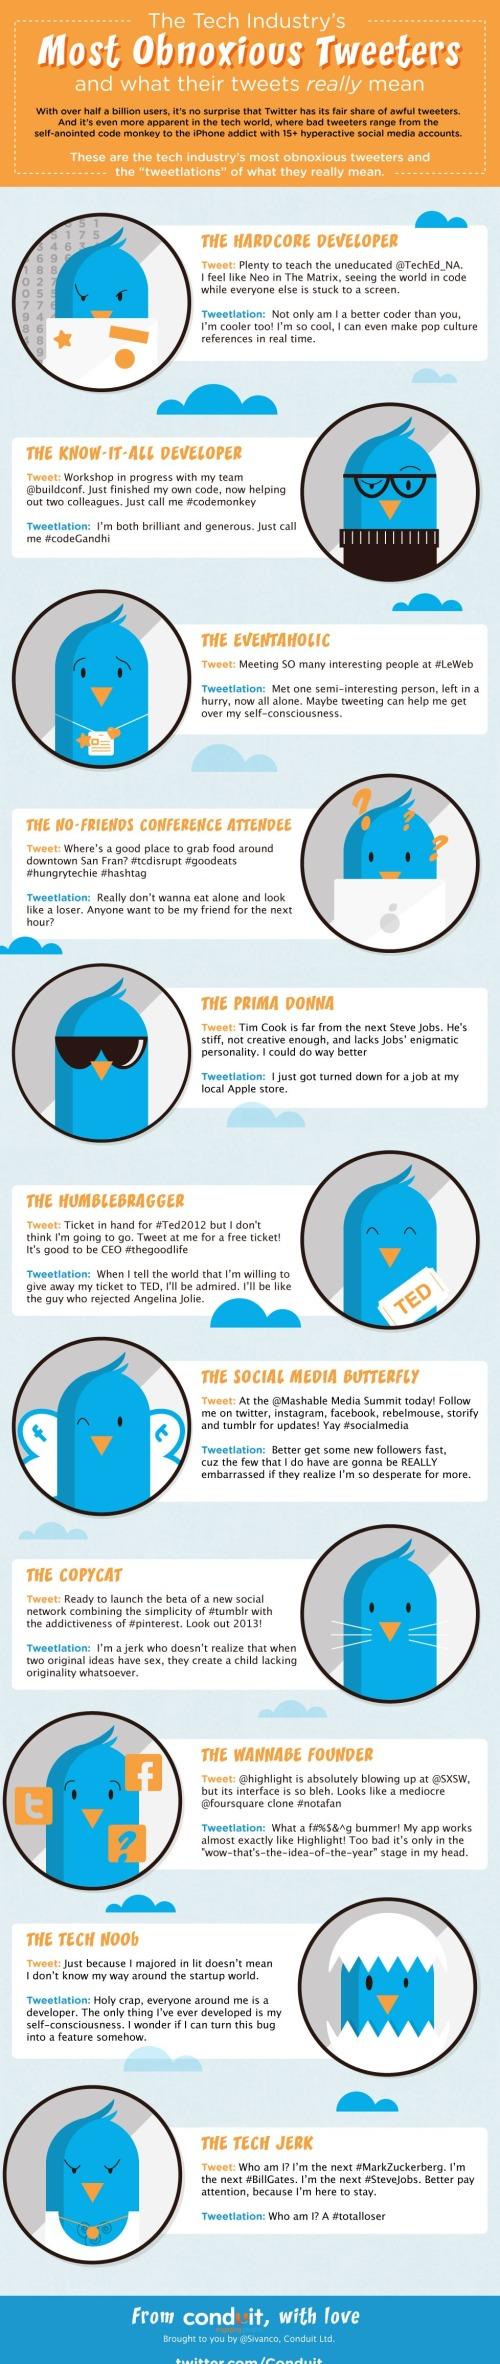 obnoxious-tweeters-infographic